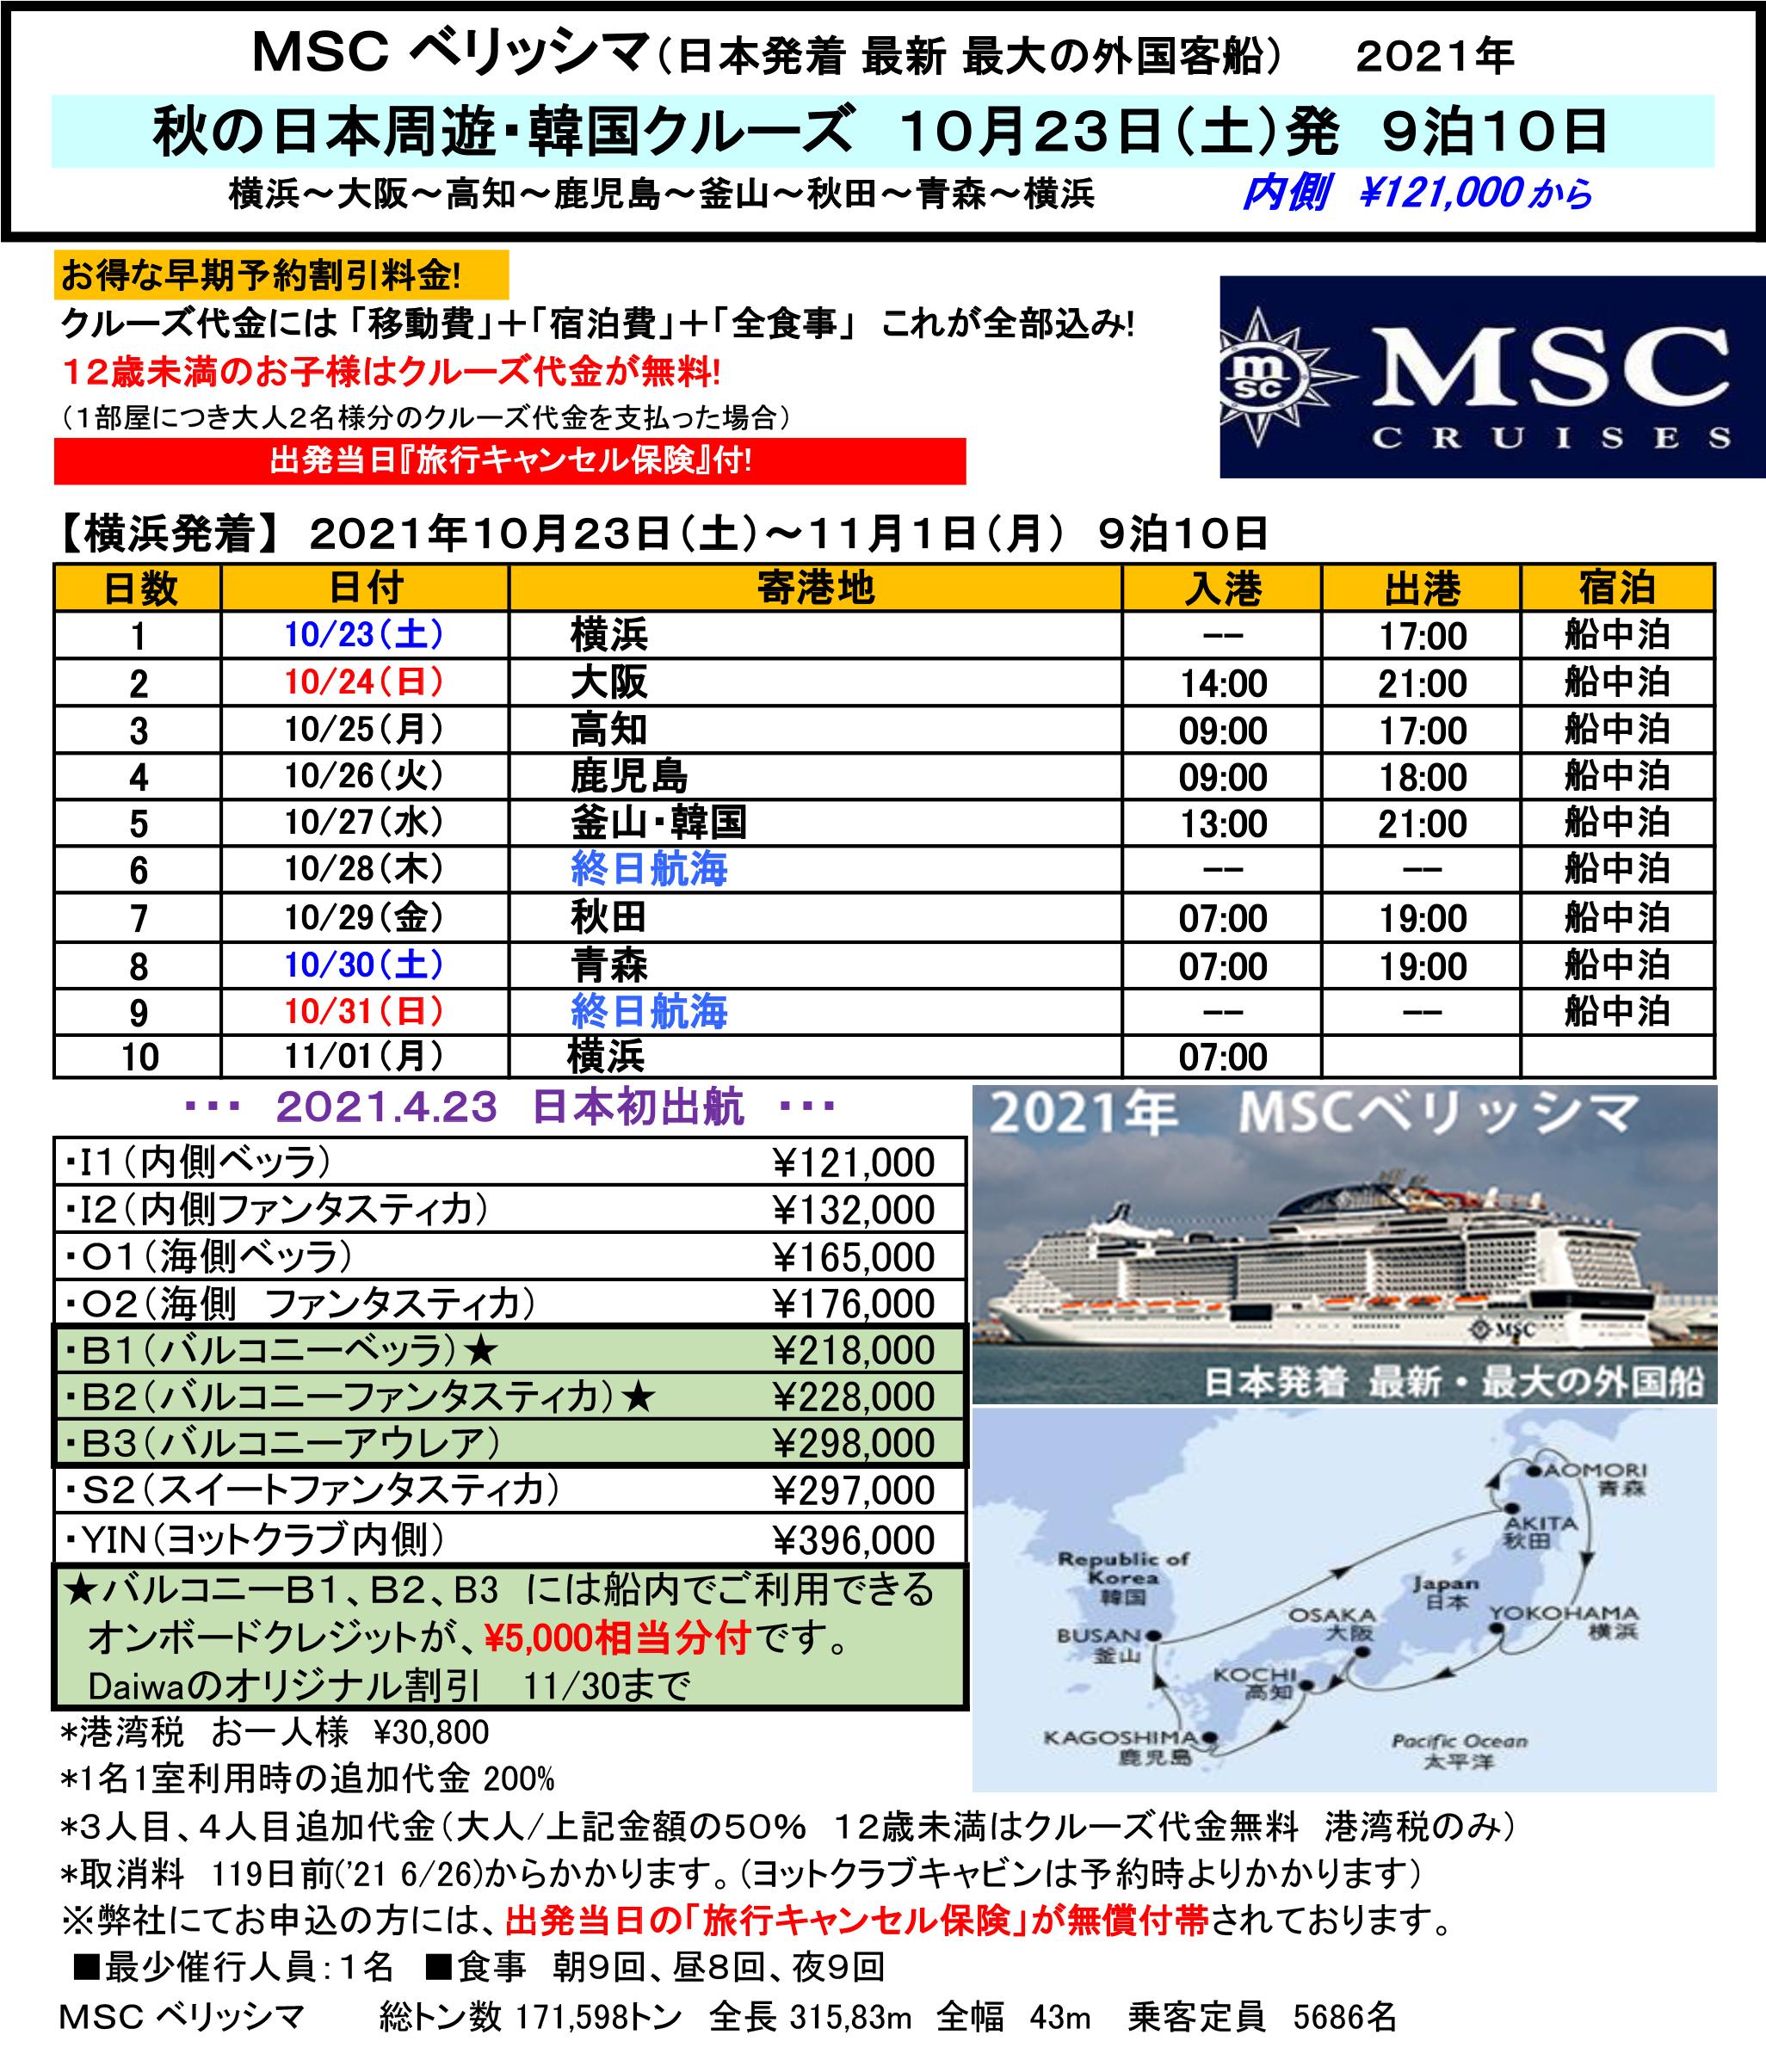 MSCベリッシマ 10月23日発9泊10日